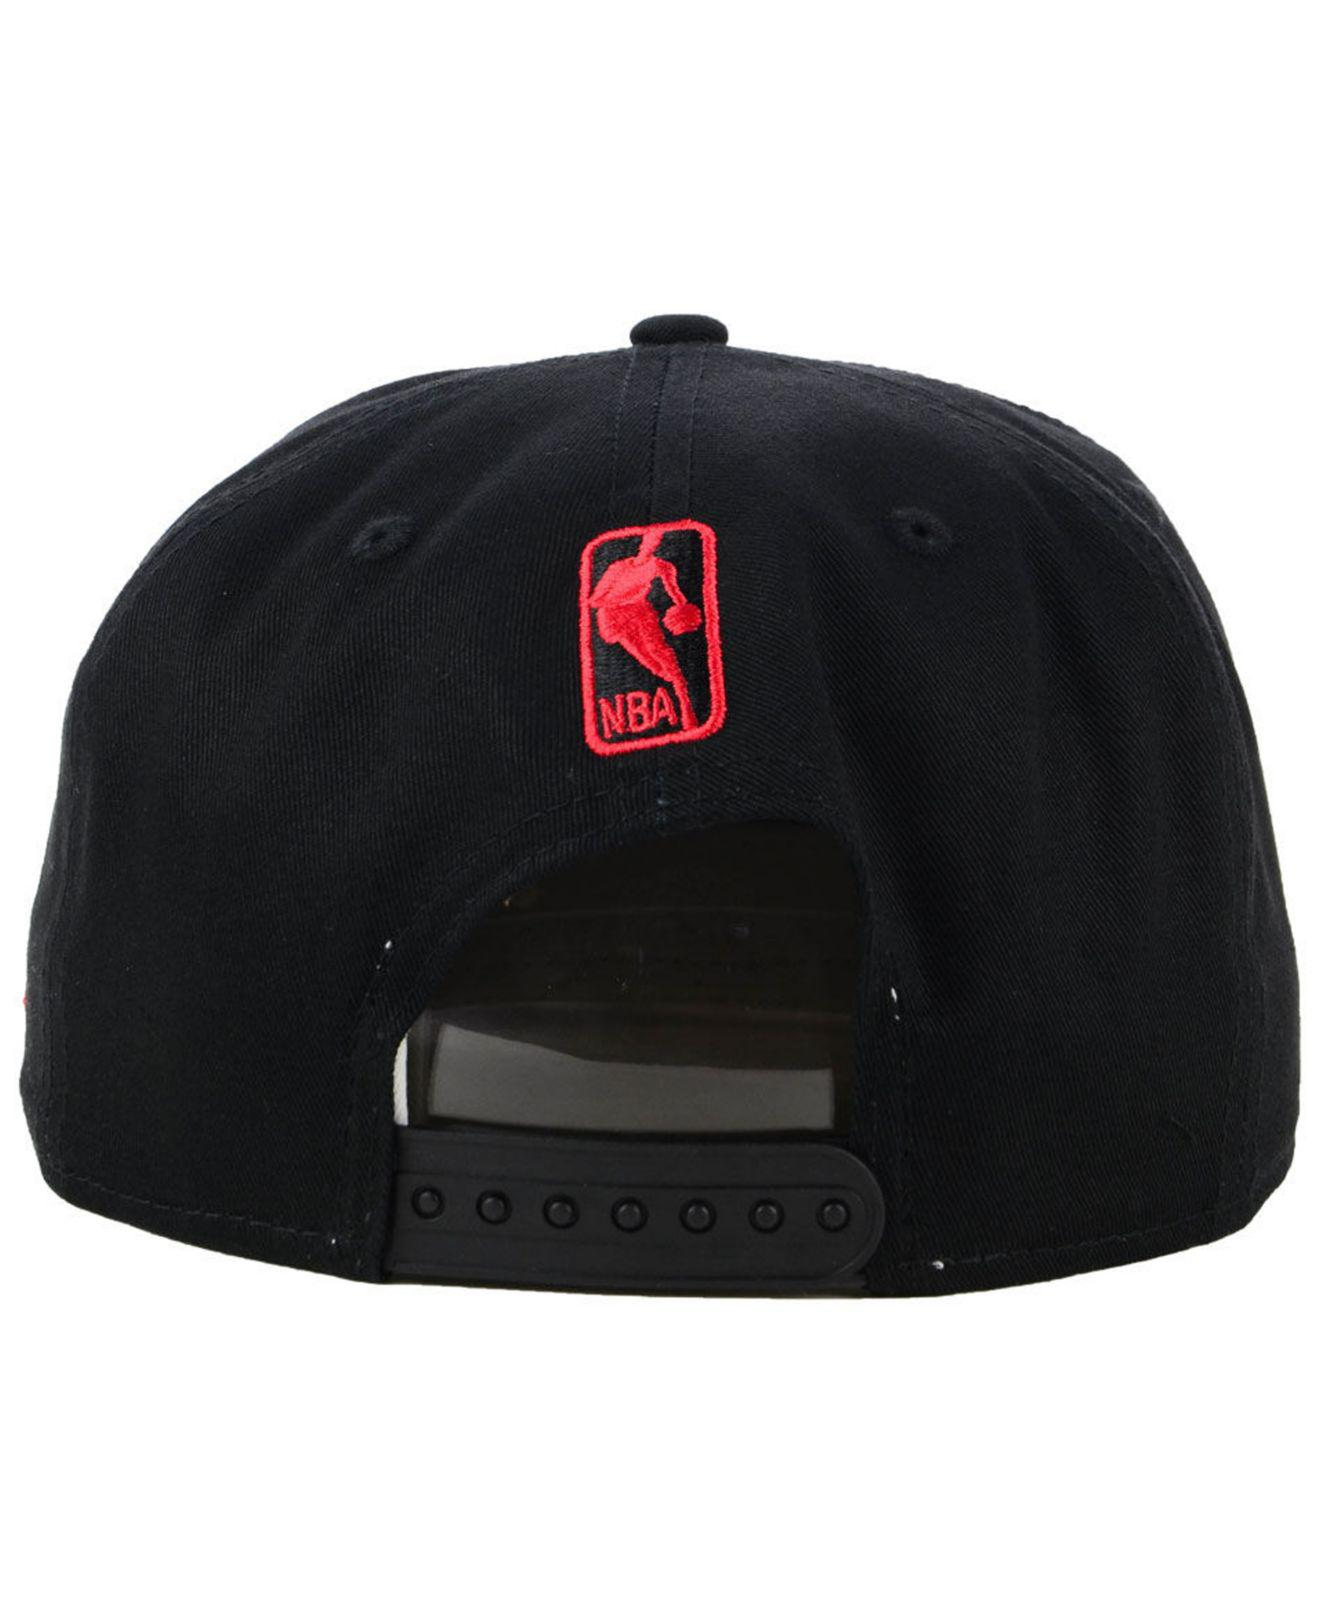 new product 3ec63 41dd3 ... best price toronto raptors retro arch 9fifty snapback cap for men lyst.  view fullscreen 32639